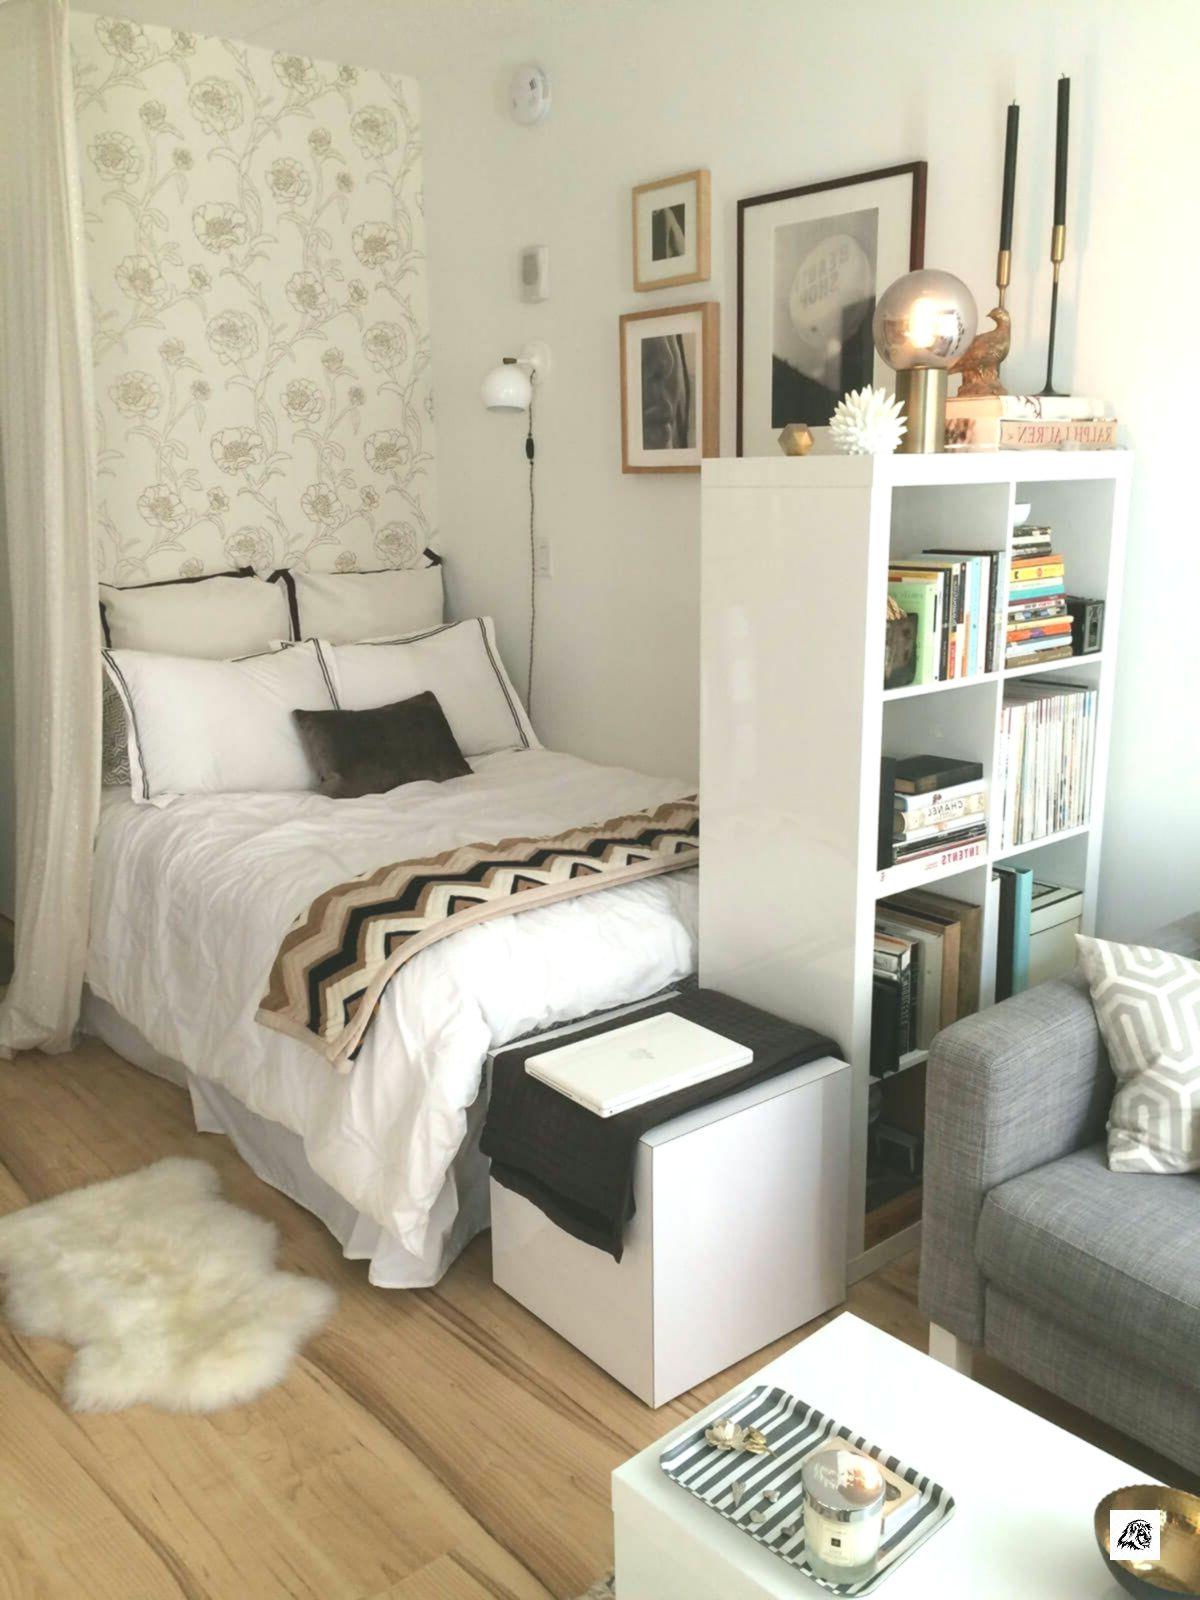 25+ design my room 2019 & Amazing Bedroom Ideas 2019 - bedroom.modella.club #kidsbedroomsandthings